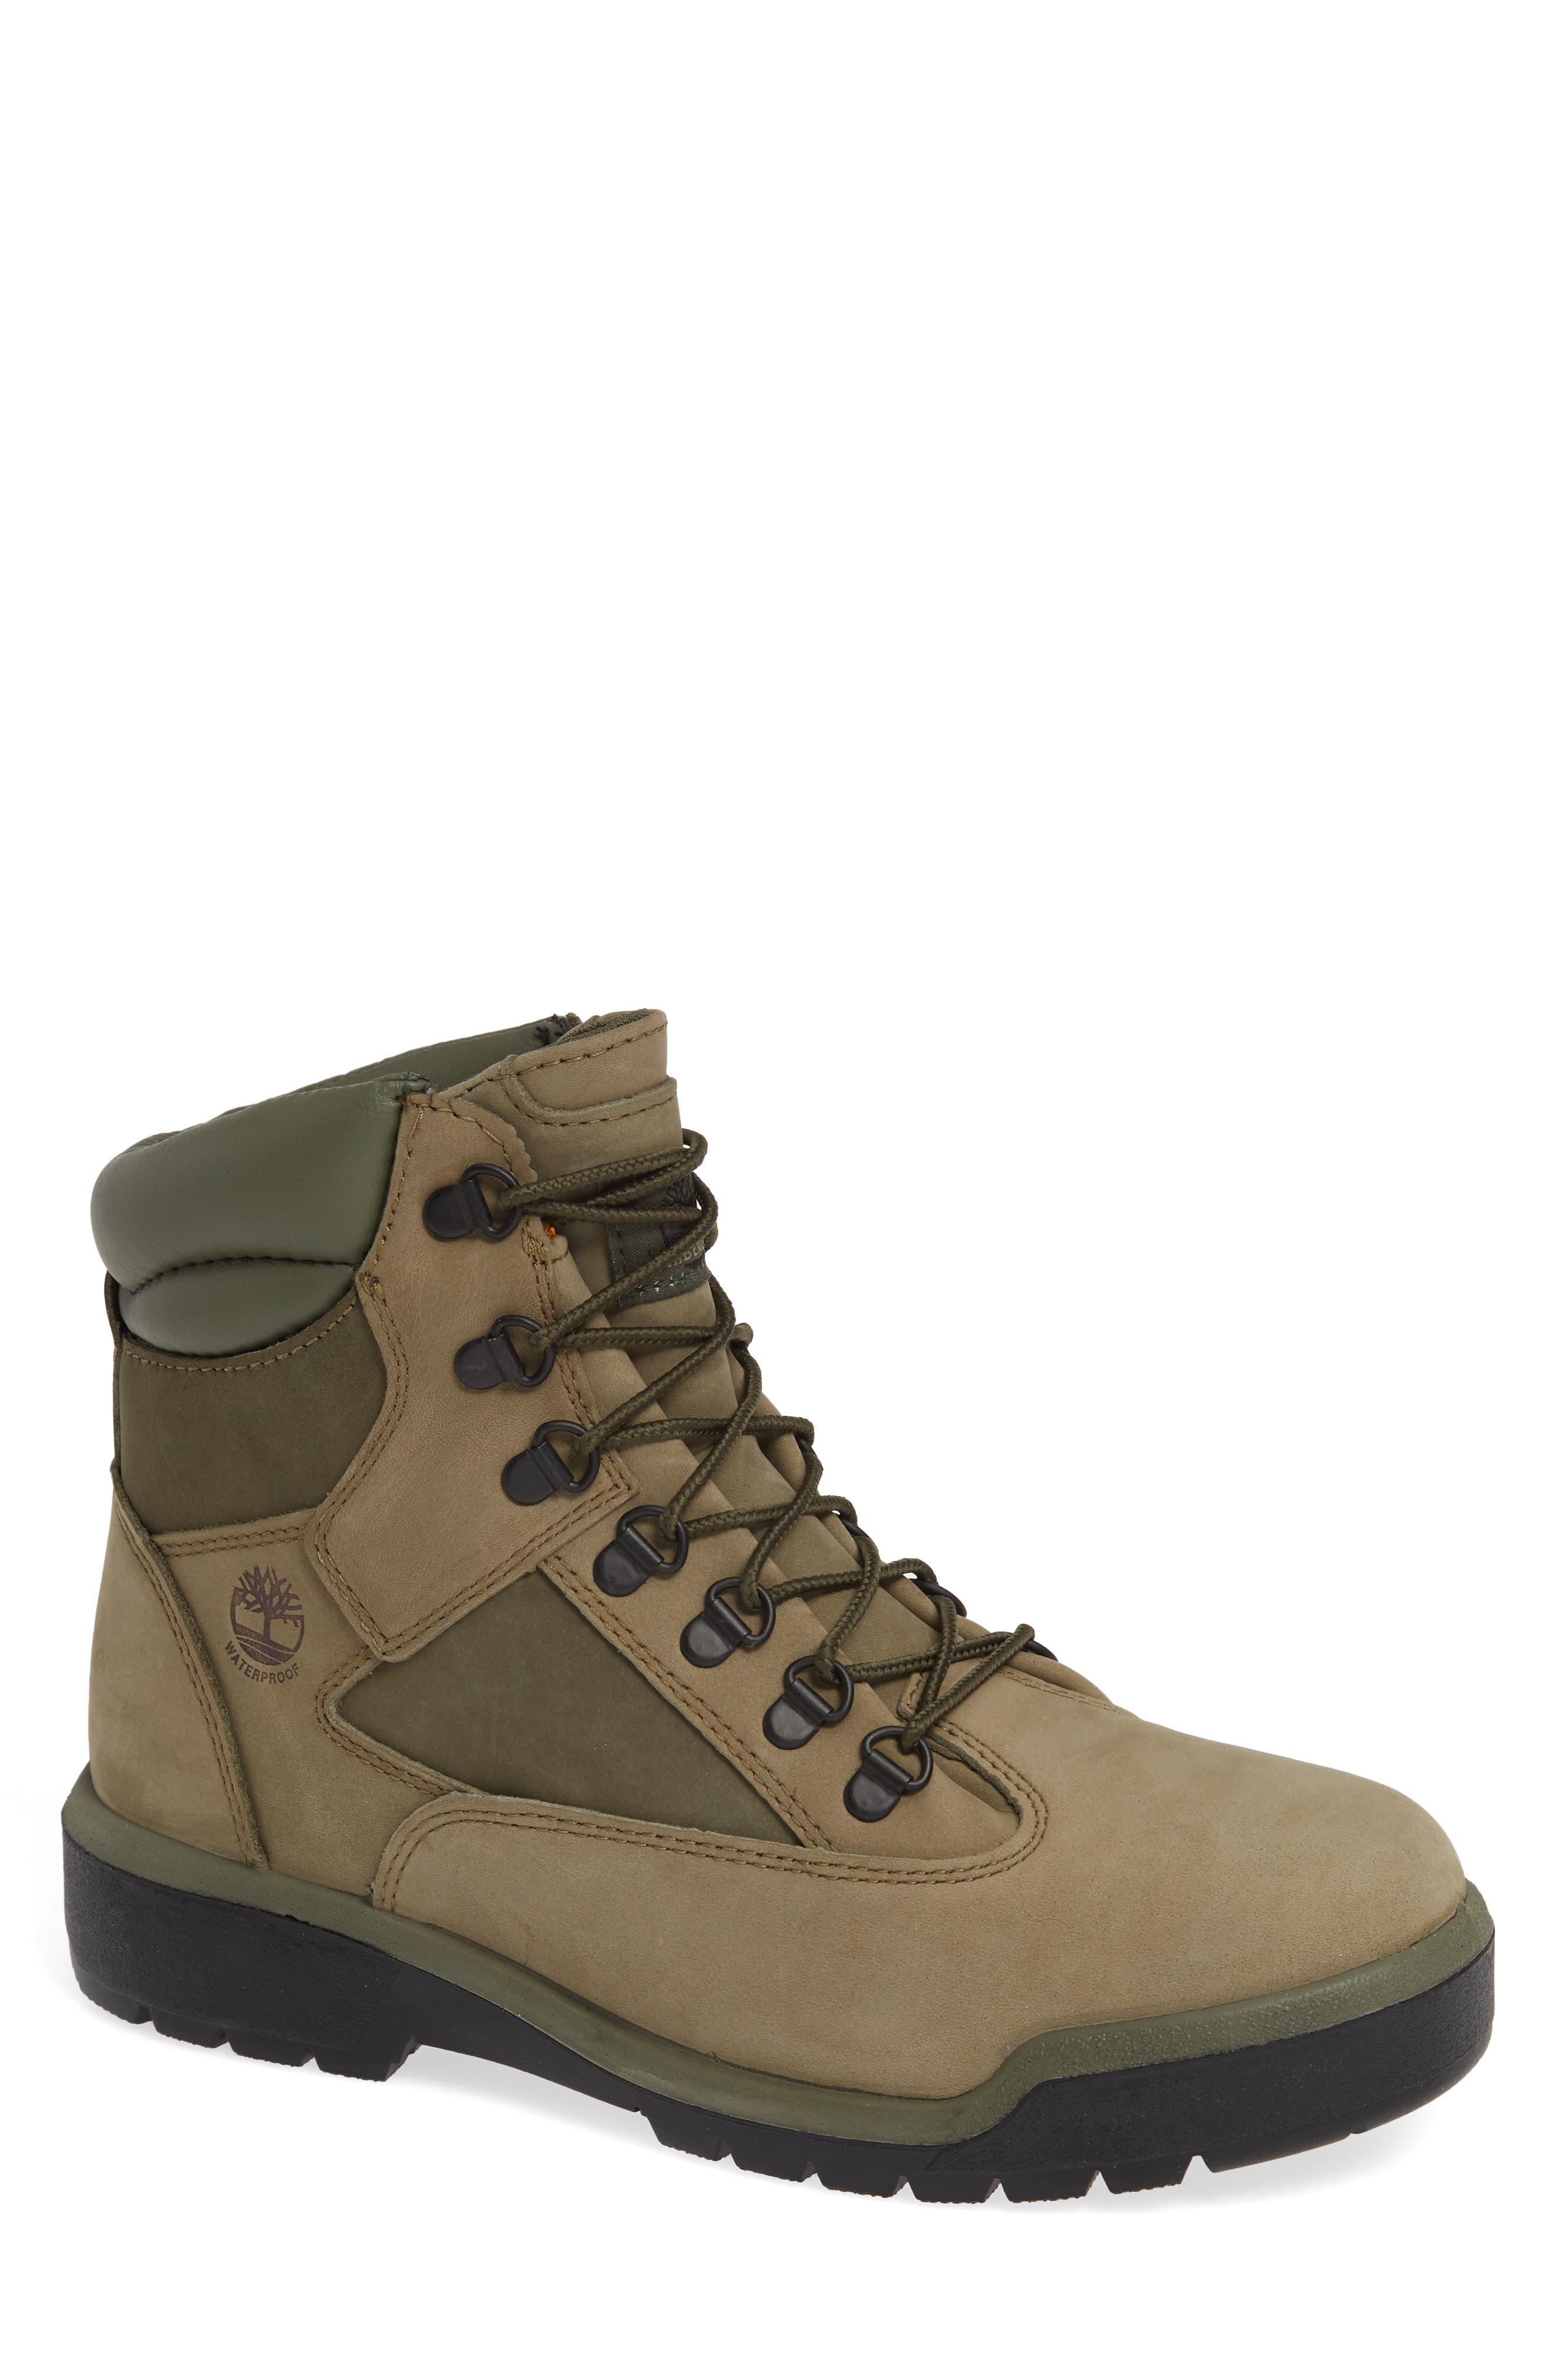 Field Waterproof Boot,                         Main,                         color, 280